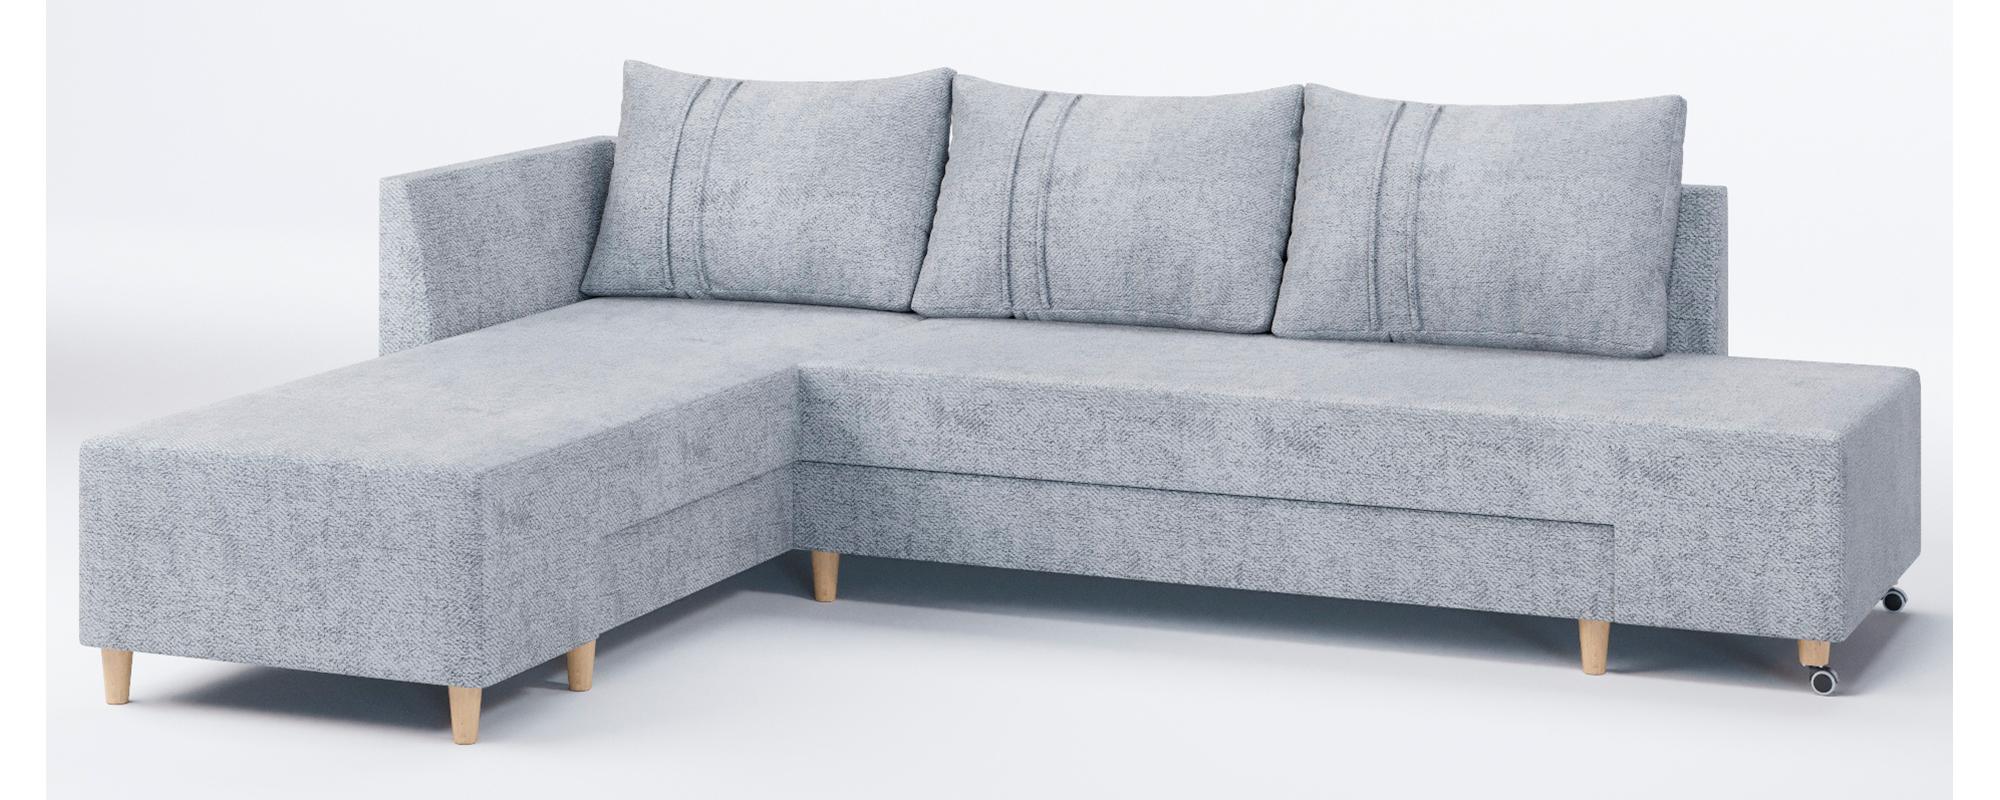 поворотный диван